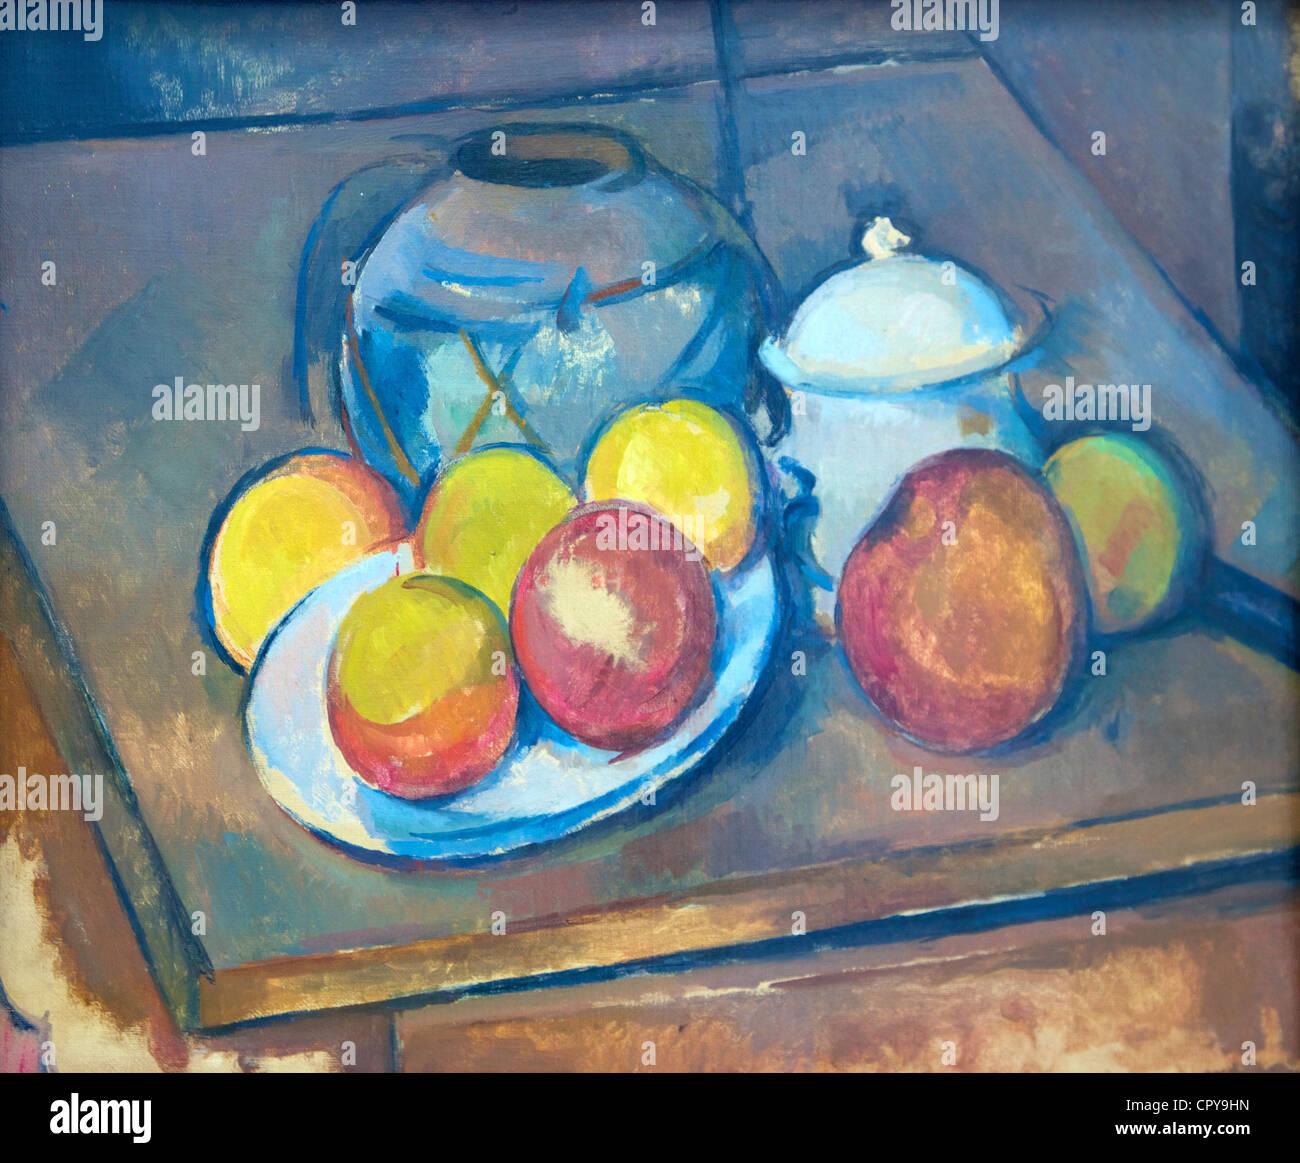 Flawed Vase, Sugar Bowl and Apples, by Paul Cezanne, 1890-93, Musee de L'Orangerie Museum, Paris, France, Europe, - Stock Image